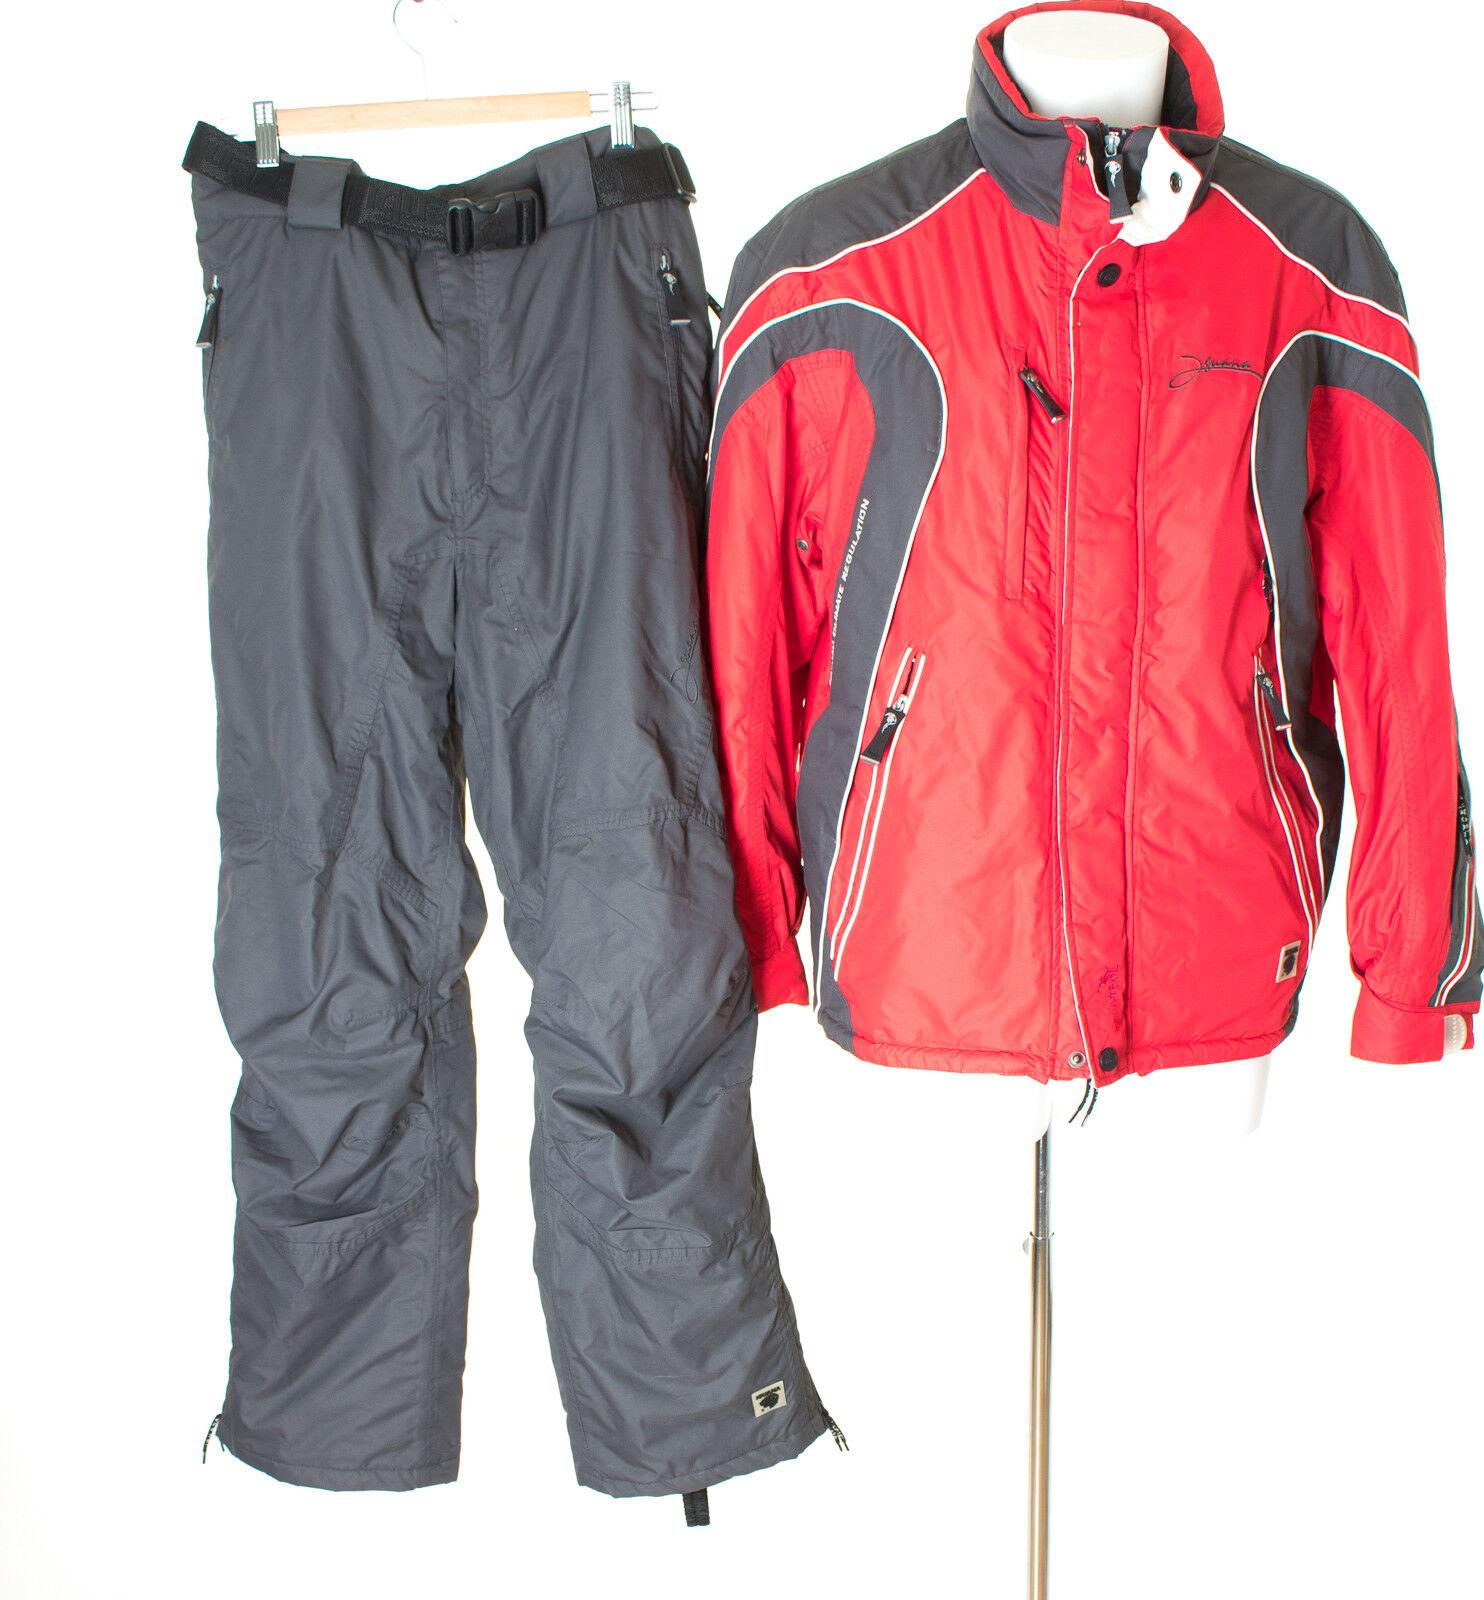 Iguana LIFE WEAR SKI Suit Thermal Suit Snow Snowboard Herren Größe L Multi-Colourot